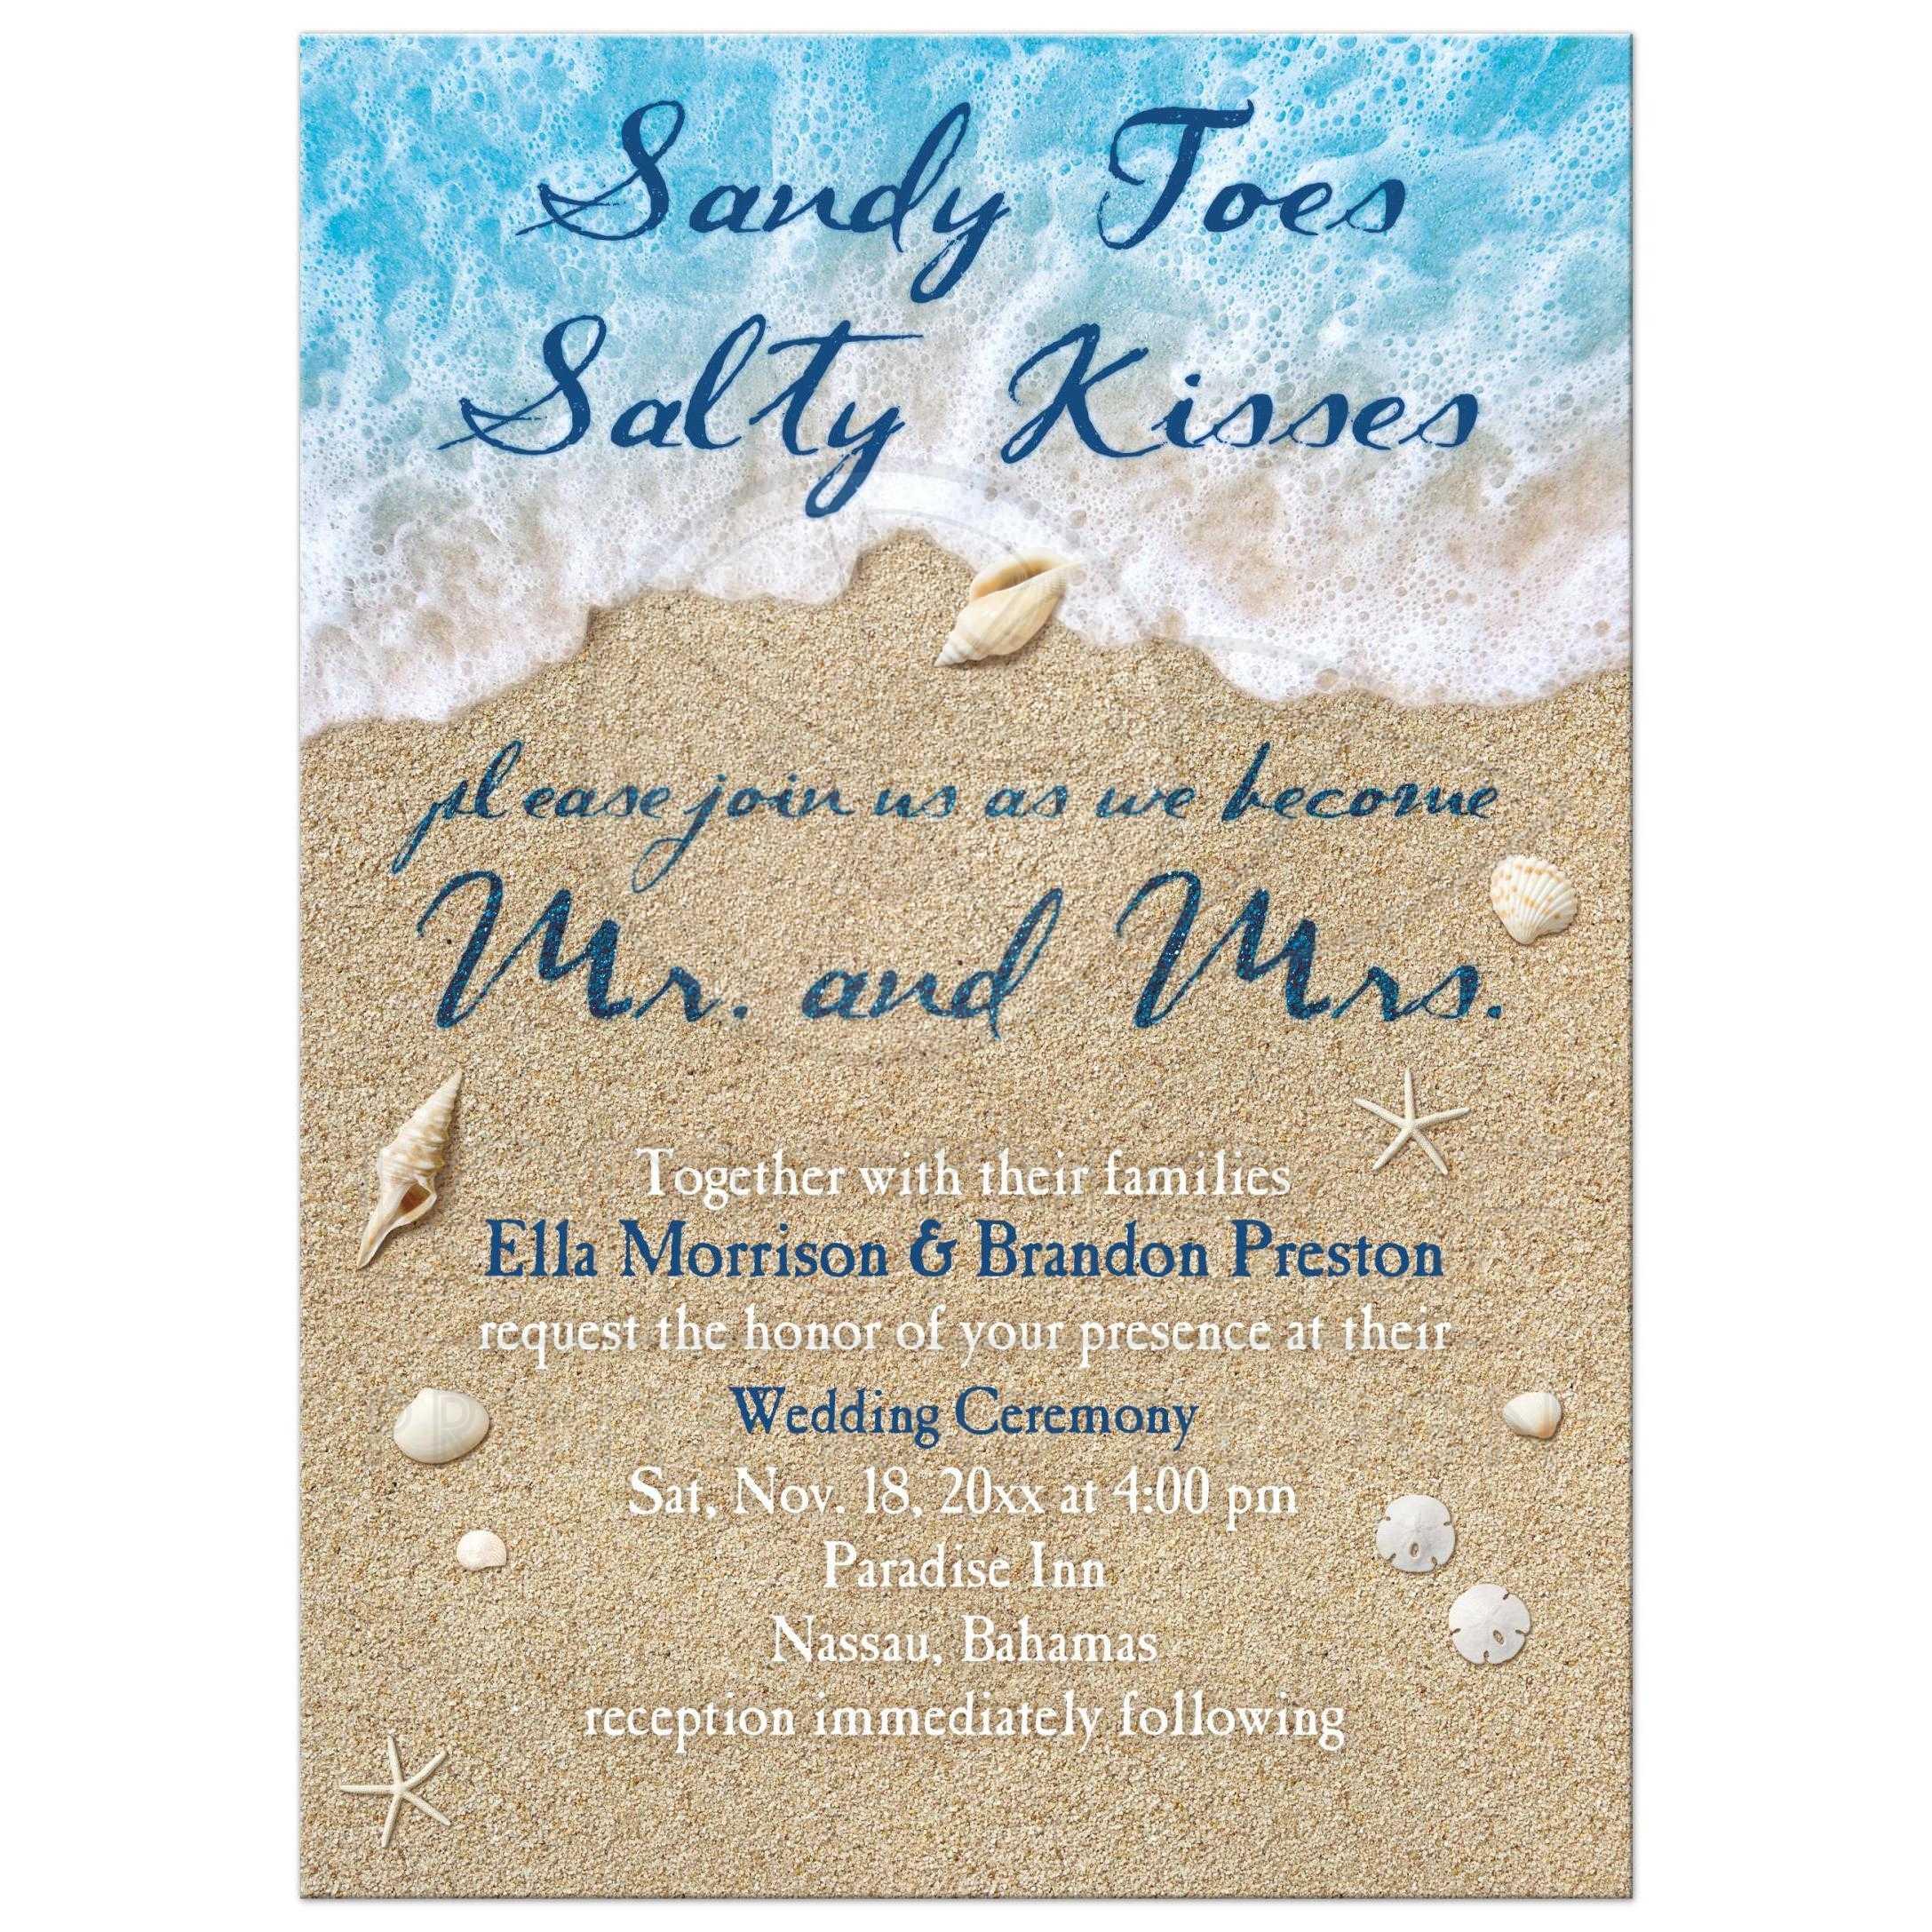 wedding invitation 2 ocean waves and beach sand